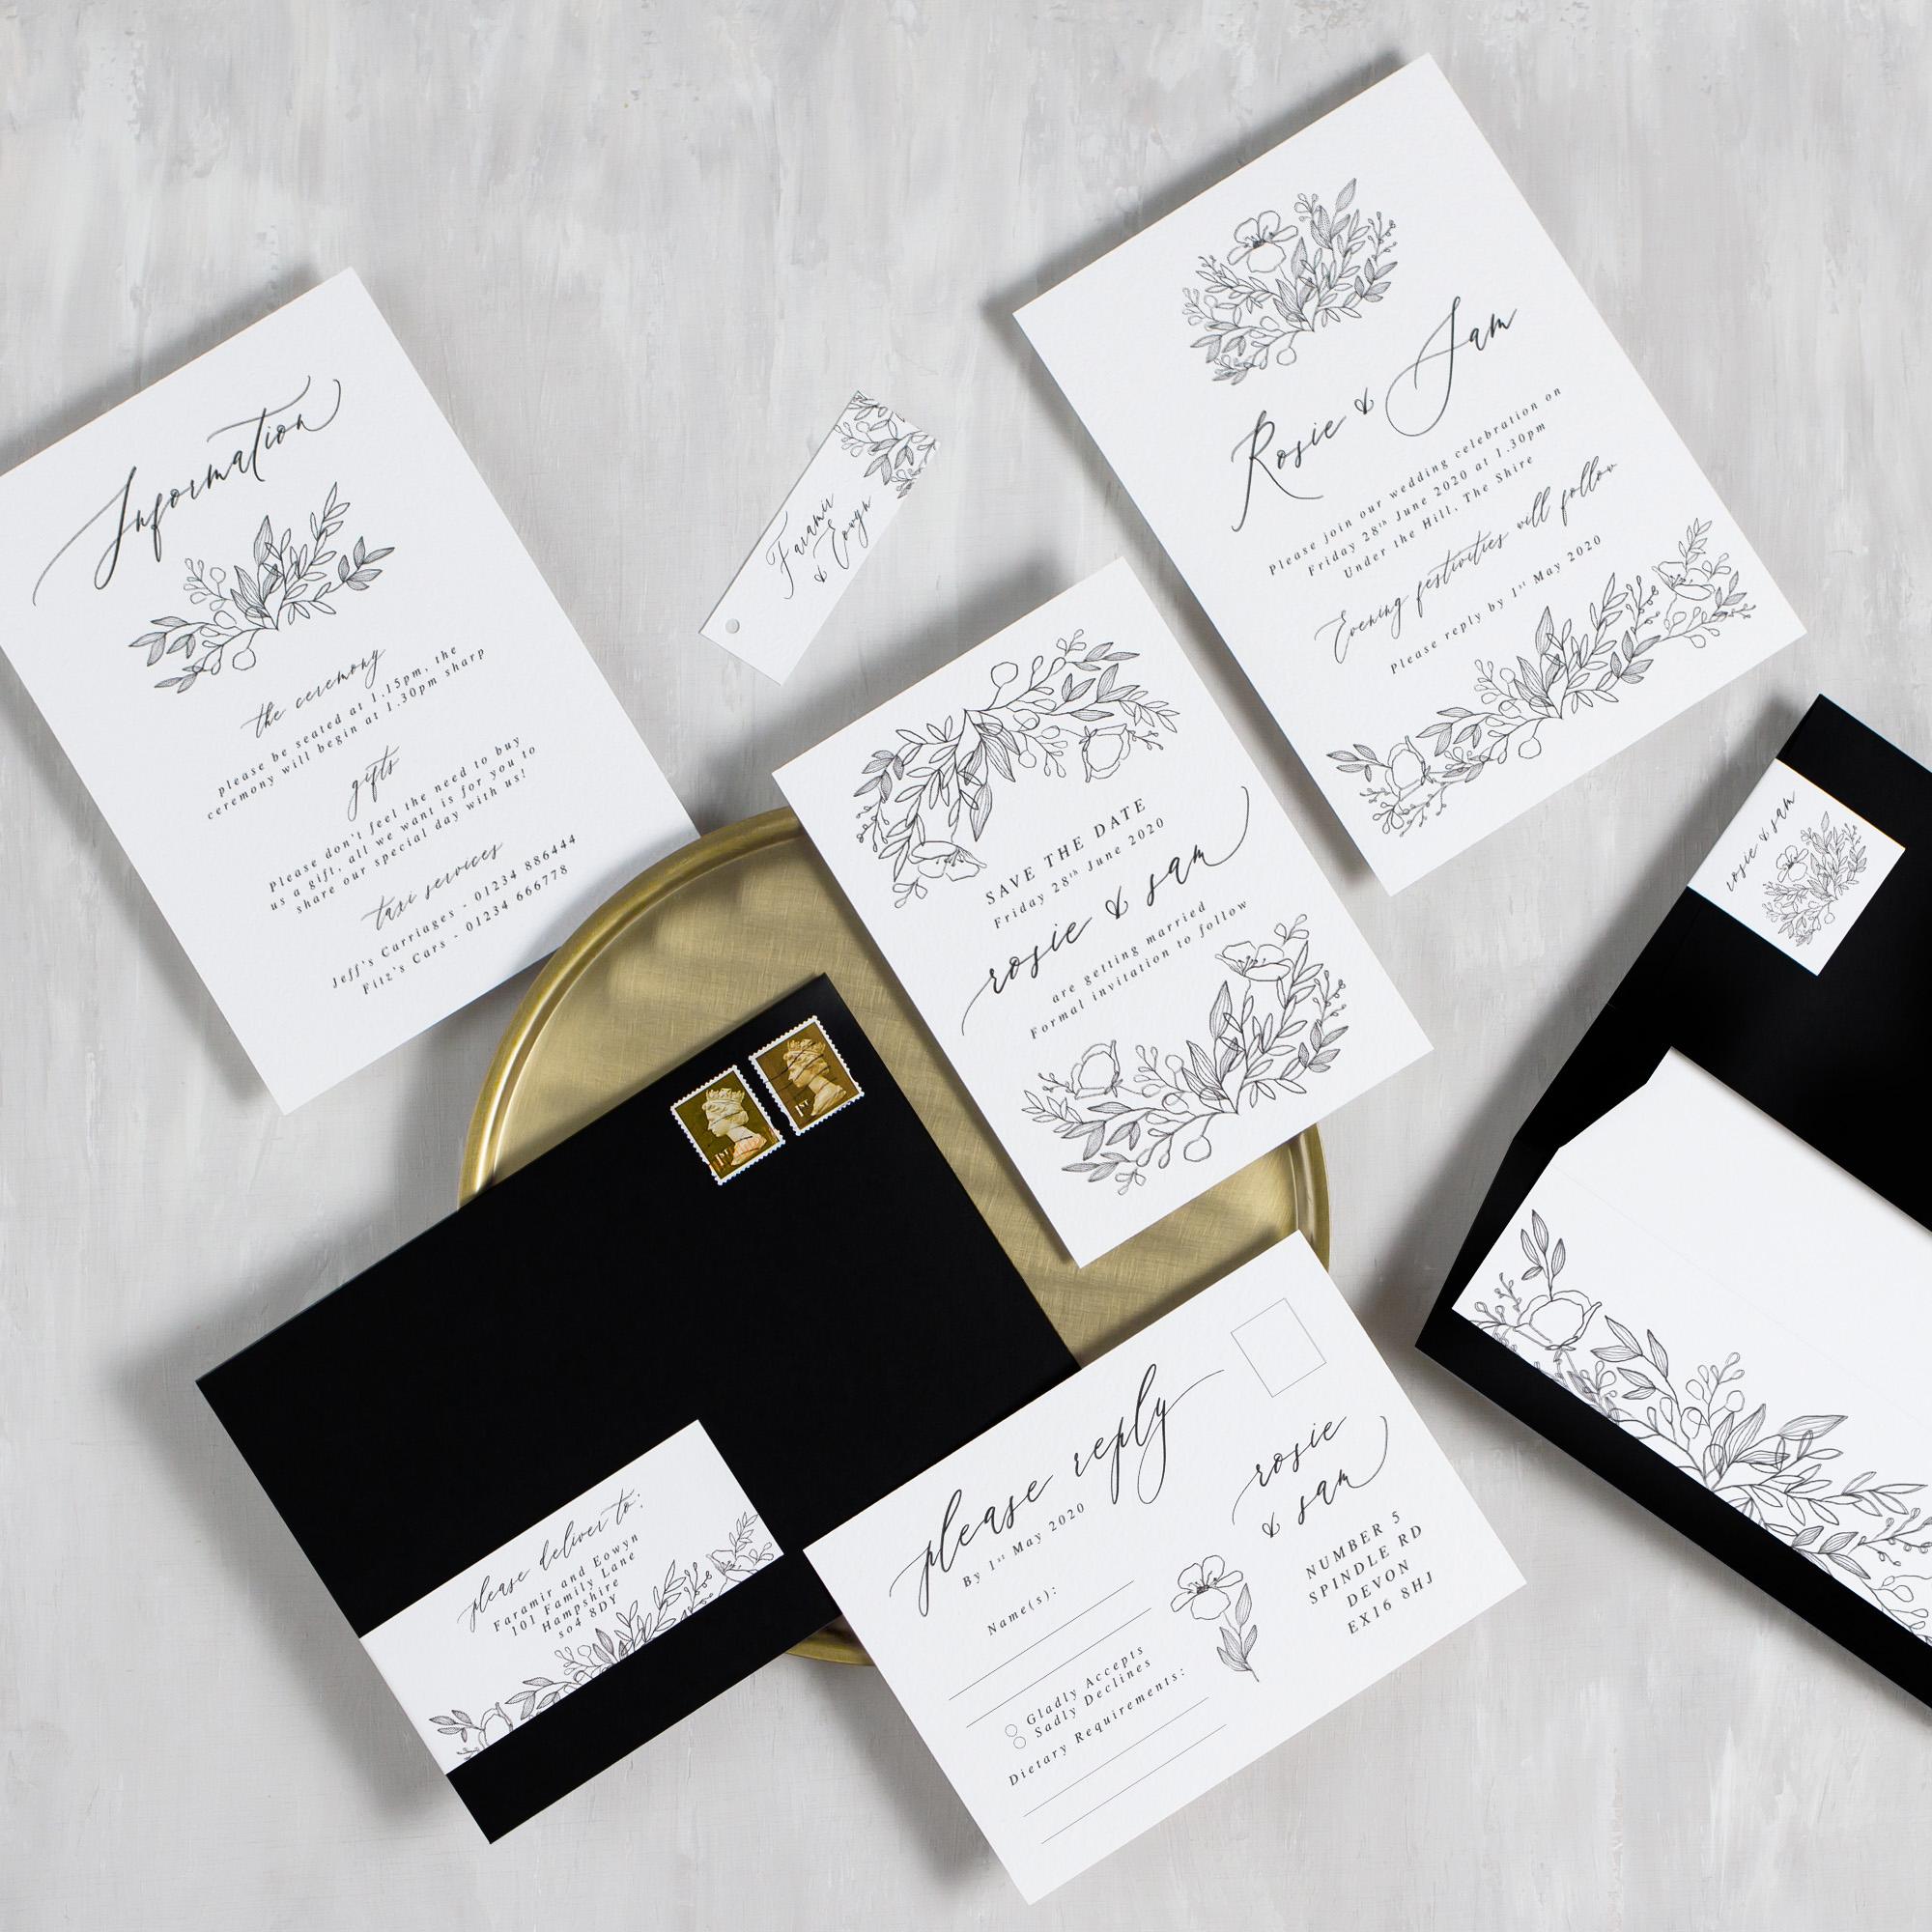 Luxury-Wedding-Stationery-Unique-Illustrated-Floral-Botanical-Leaves-Flowers-Spring-Summer-Wedding-Invitation-Compilation-Goldberry-Pingle-Pie.jpg